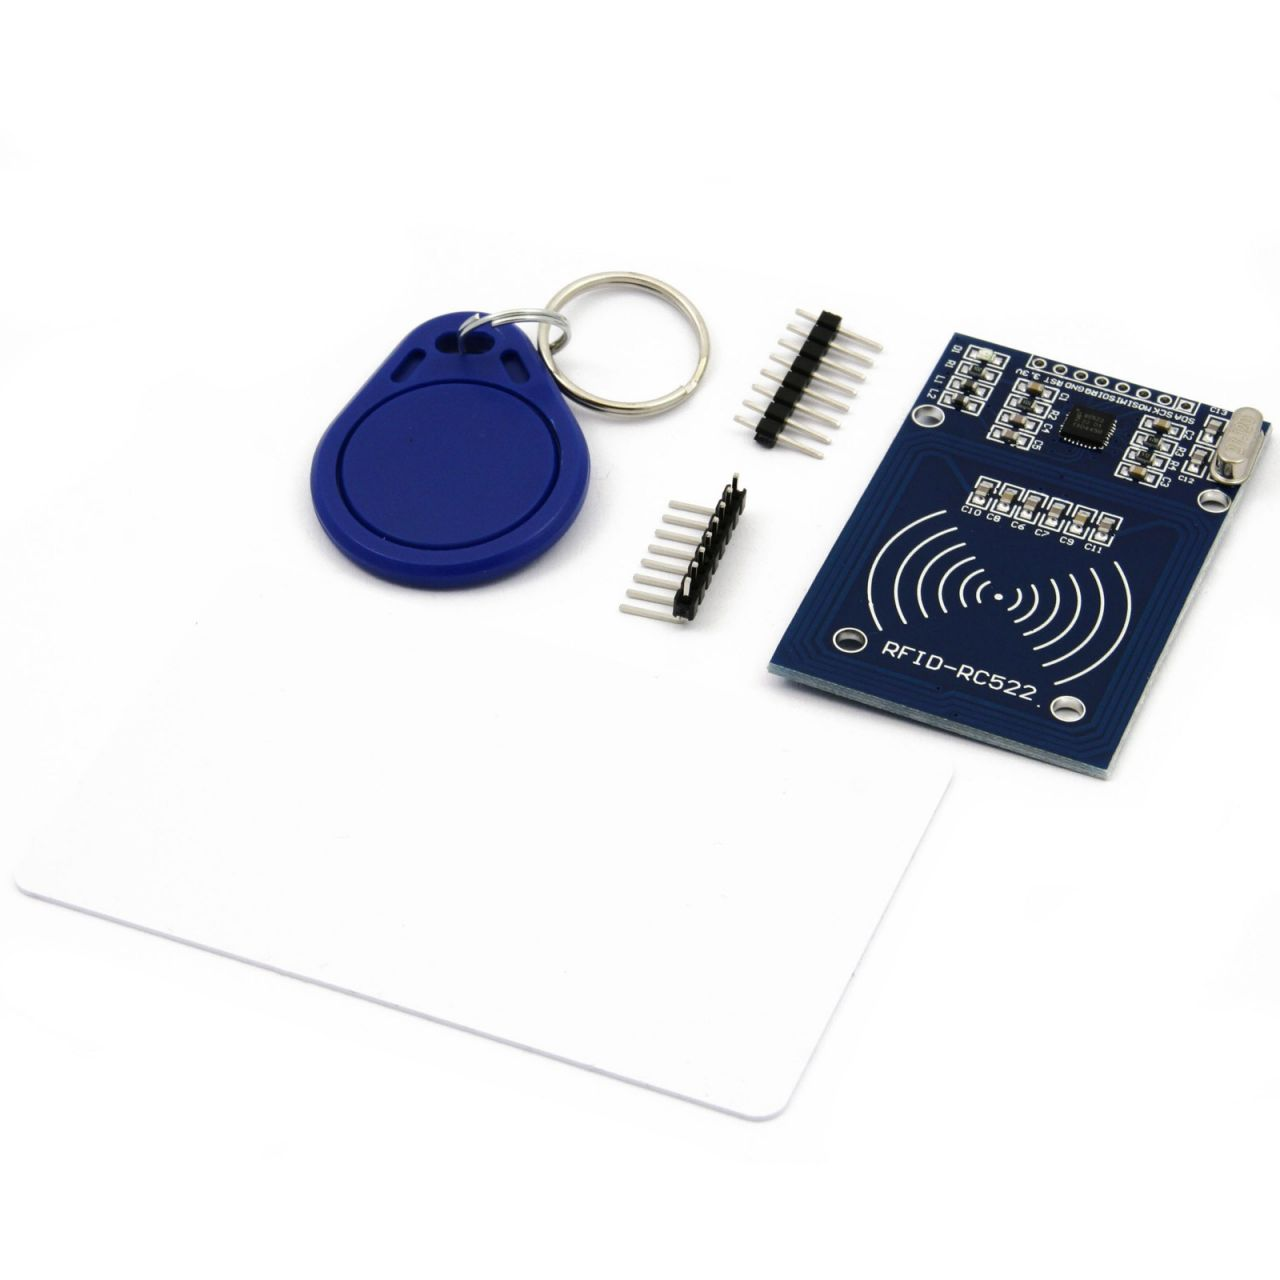 RFID Set MFRC522 - Kartenleser + Mifare Transponder-Karte